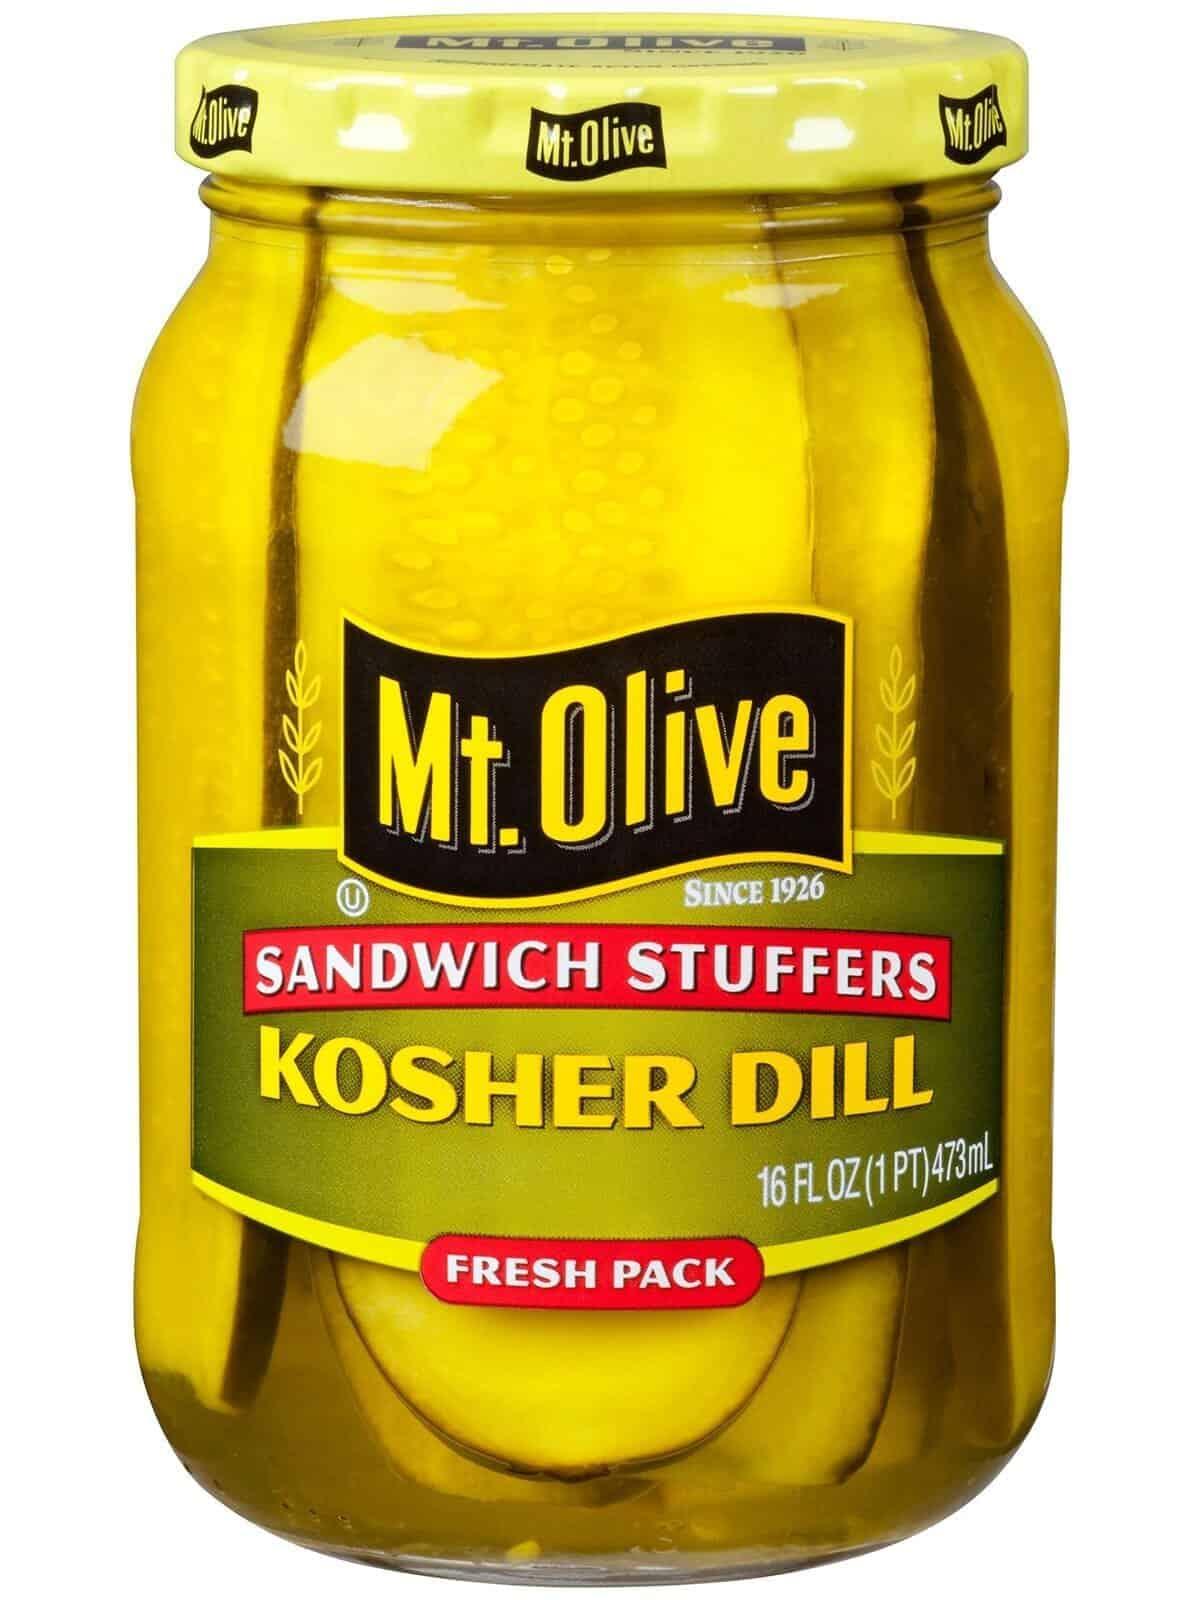 Kosher Dill Sandwich Stuffers